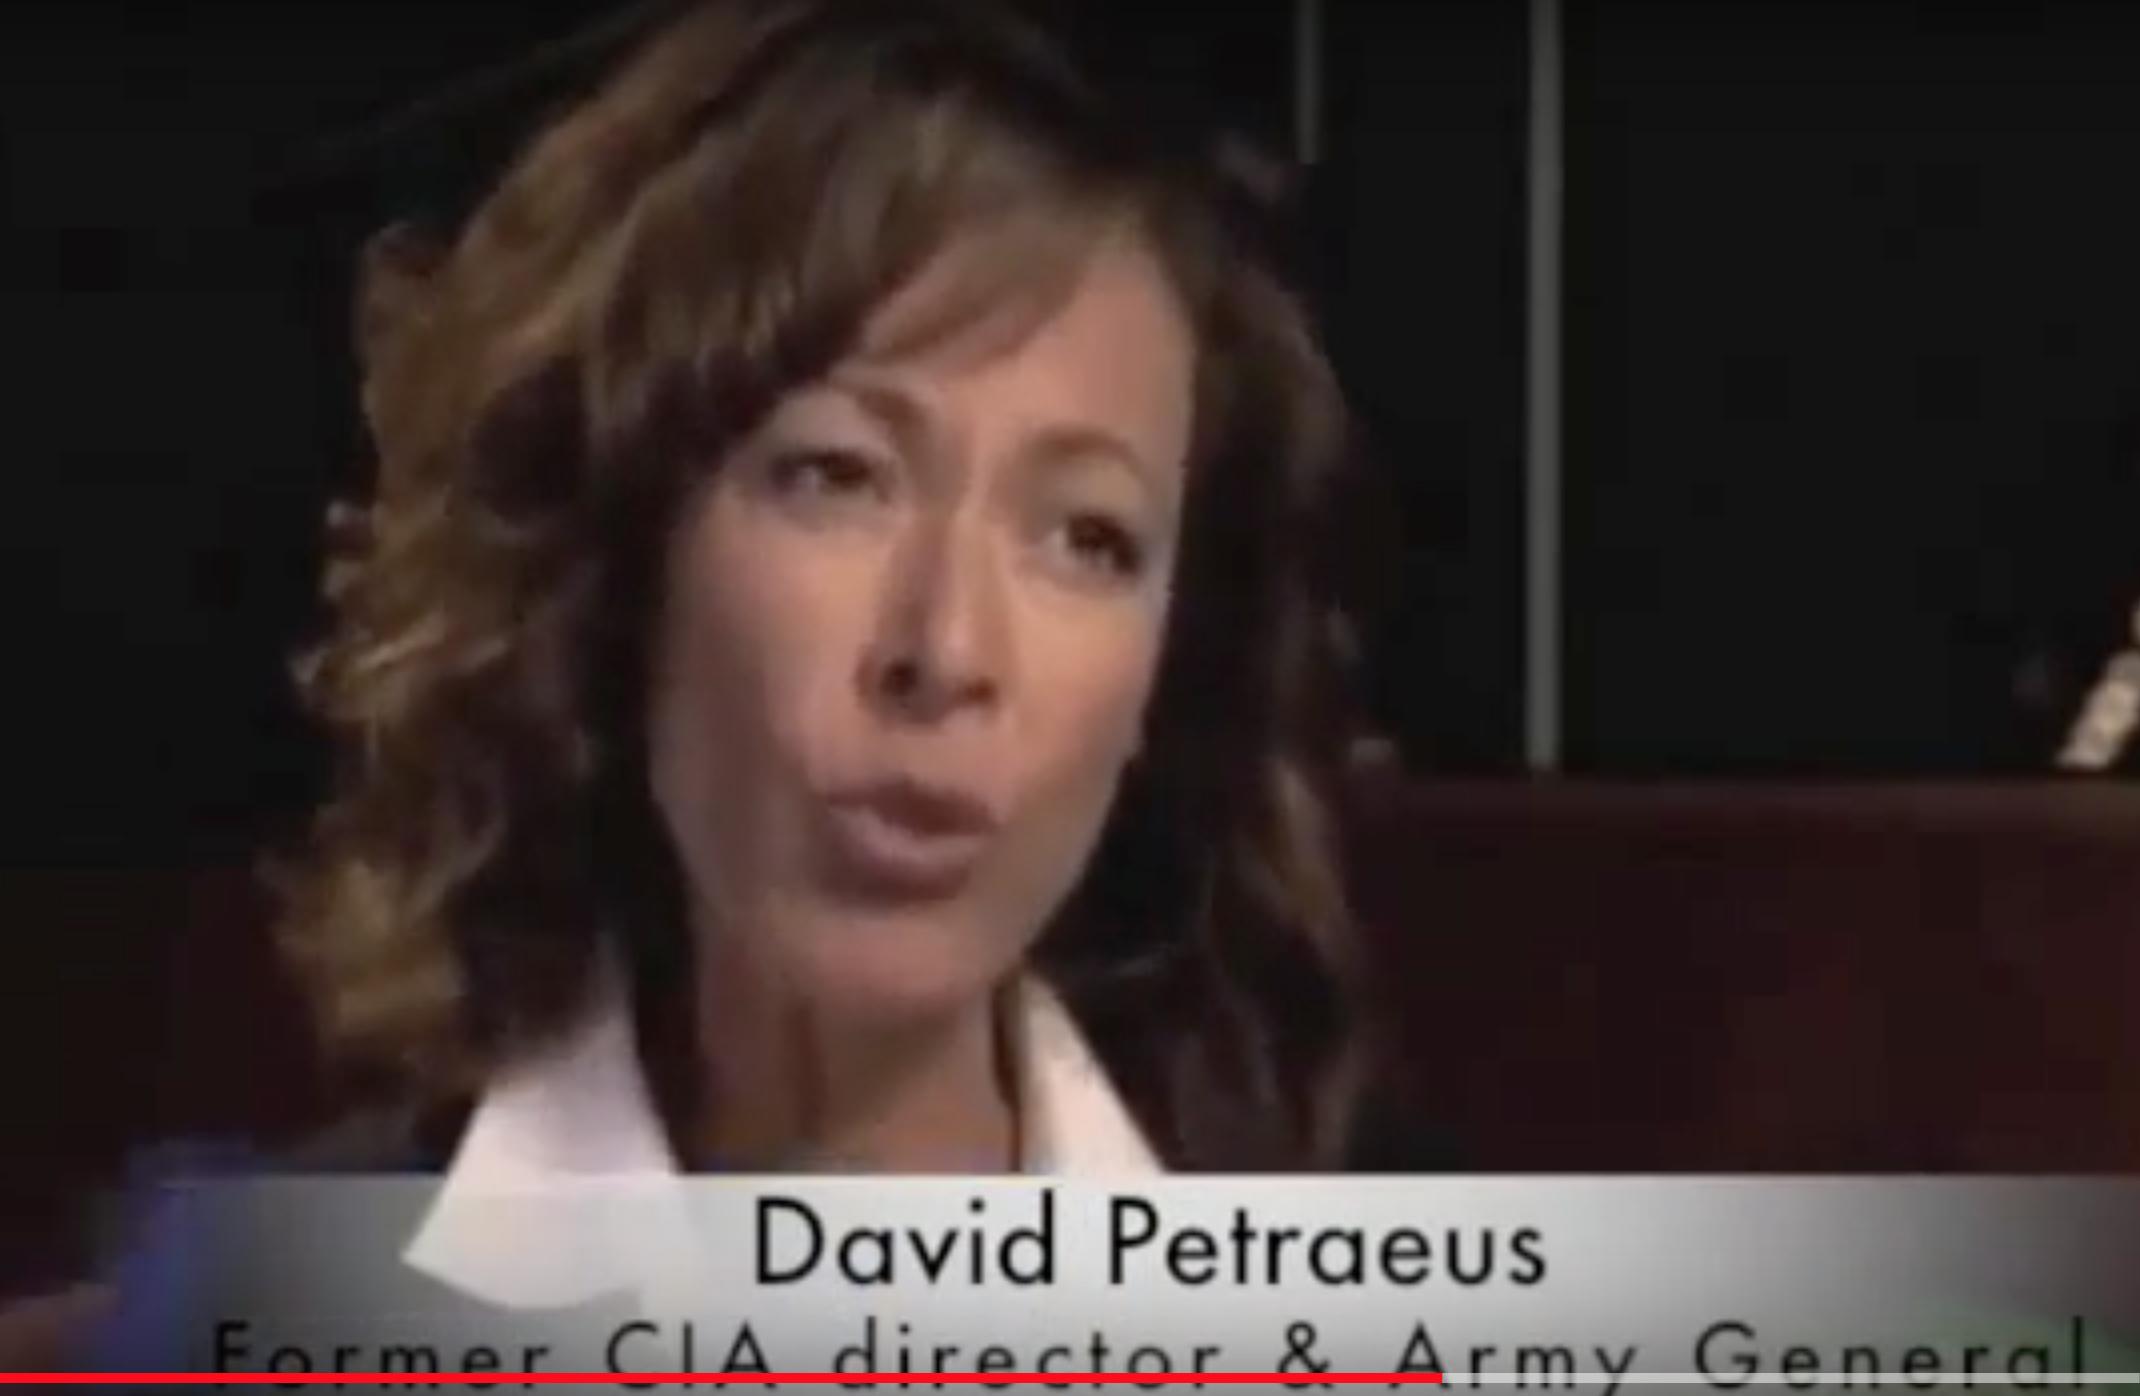 TAMARA INTERVIEWS GENERAL DAVID PETRAEUS